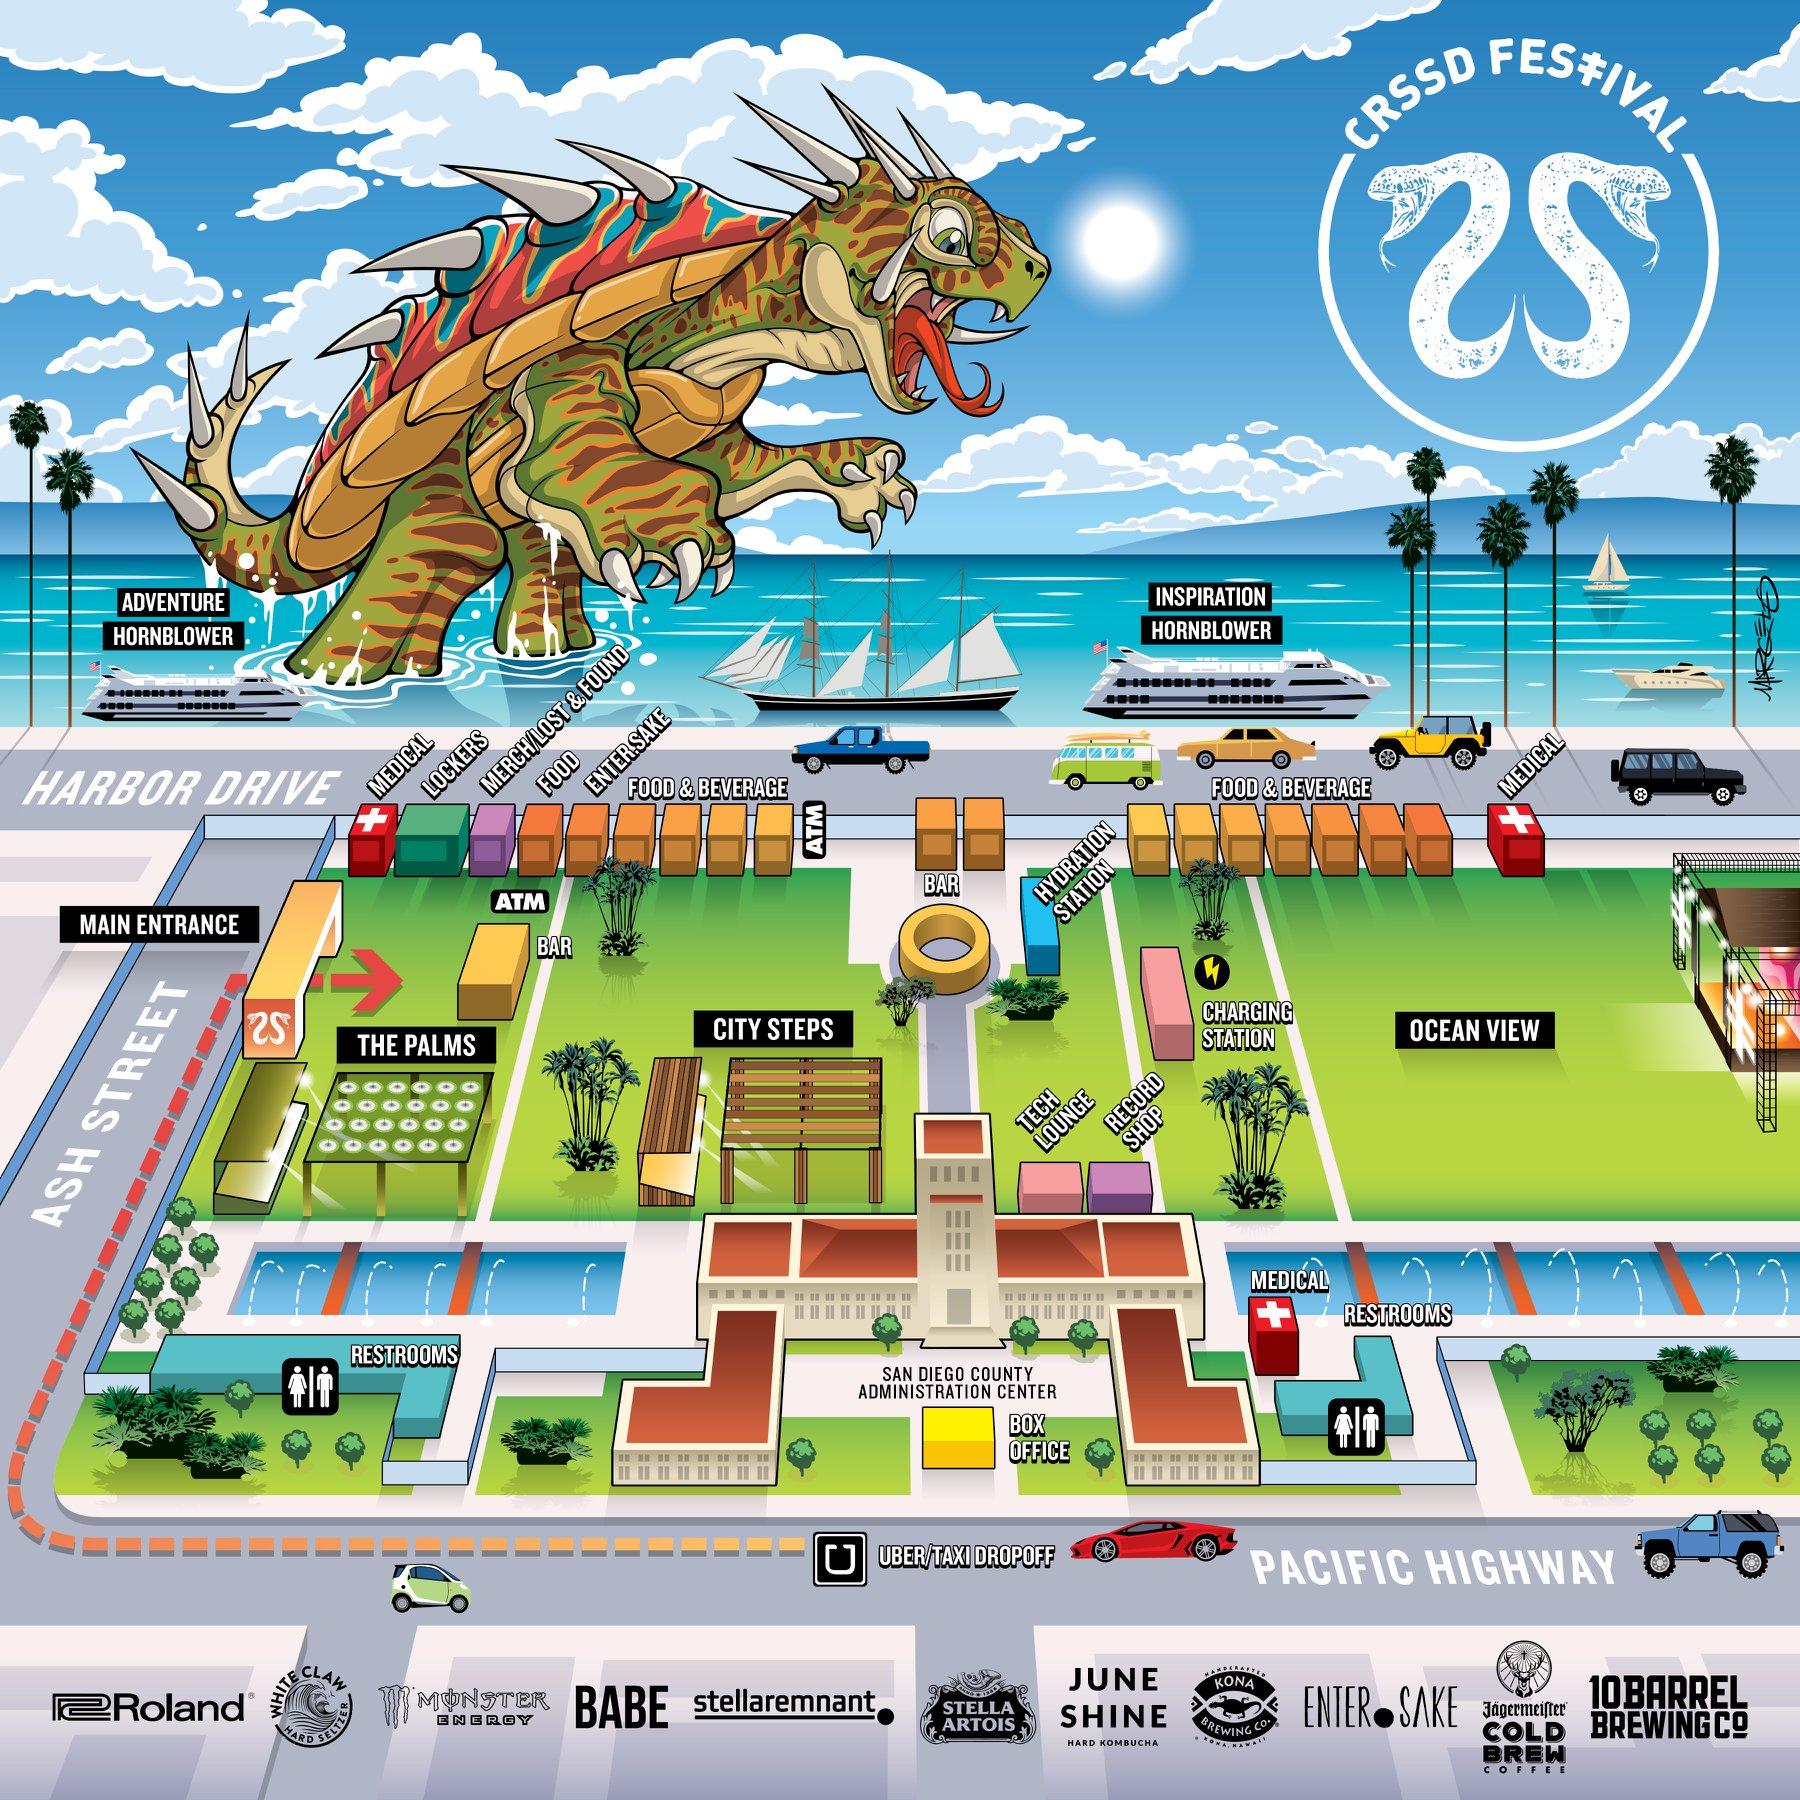 CRSSD Festival Spring 2020 - Map